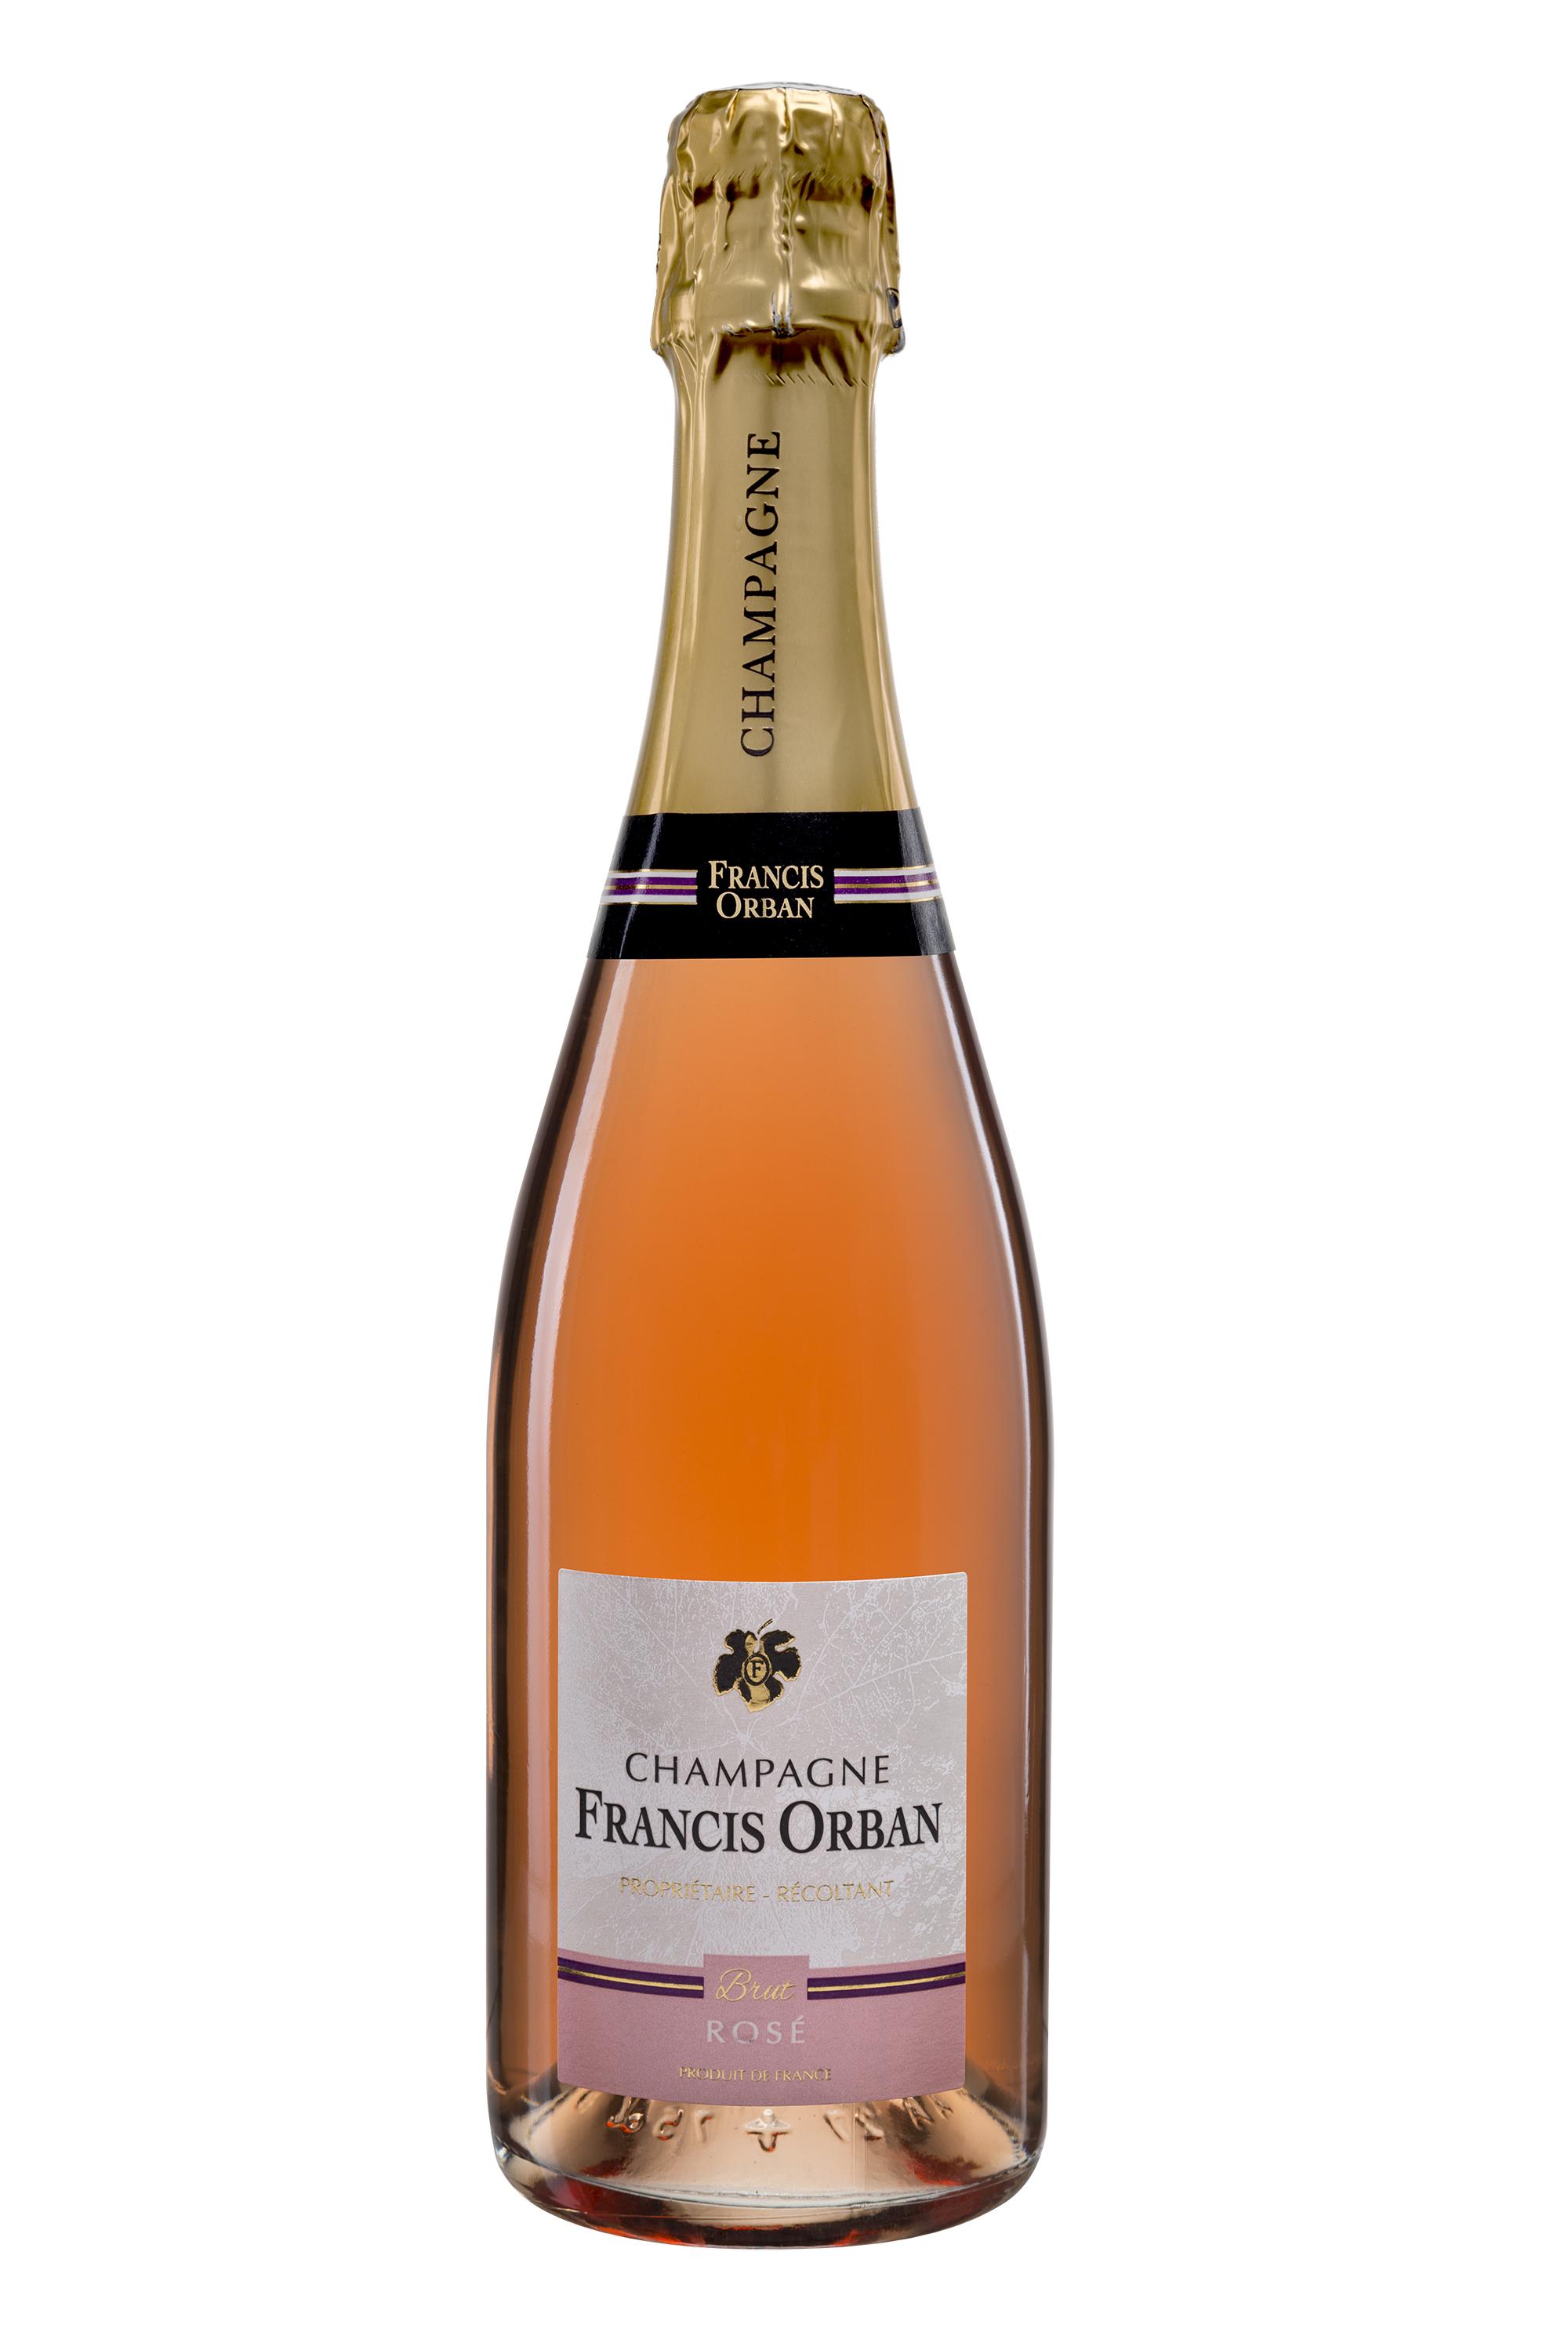 Champagne Francis Orban Brut Rosé